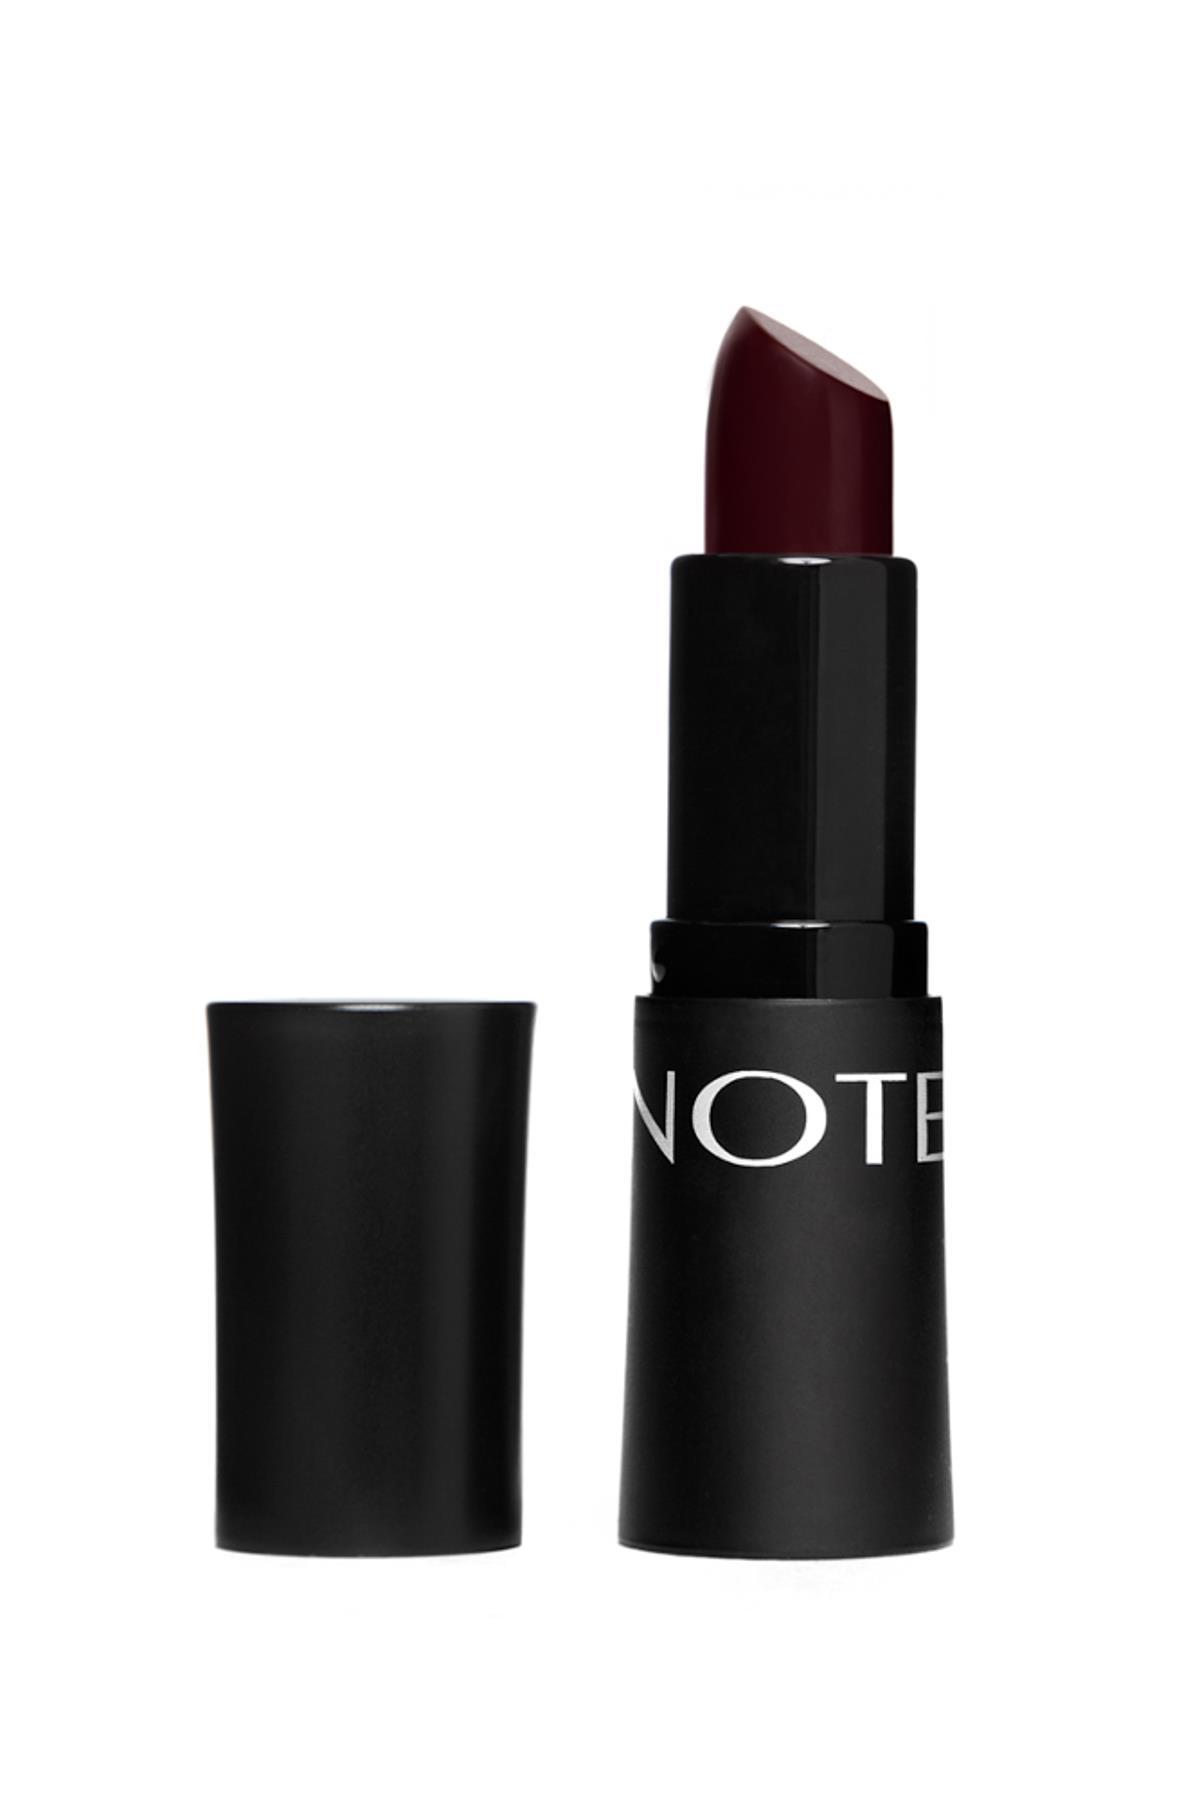 Note Mattemoist Lipstick 308 Brand Ruj